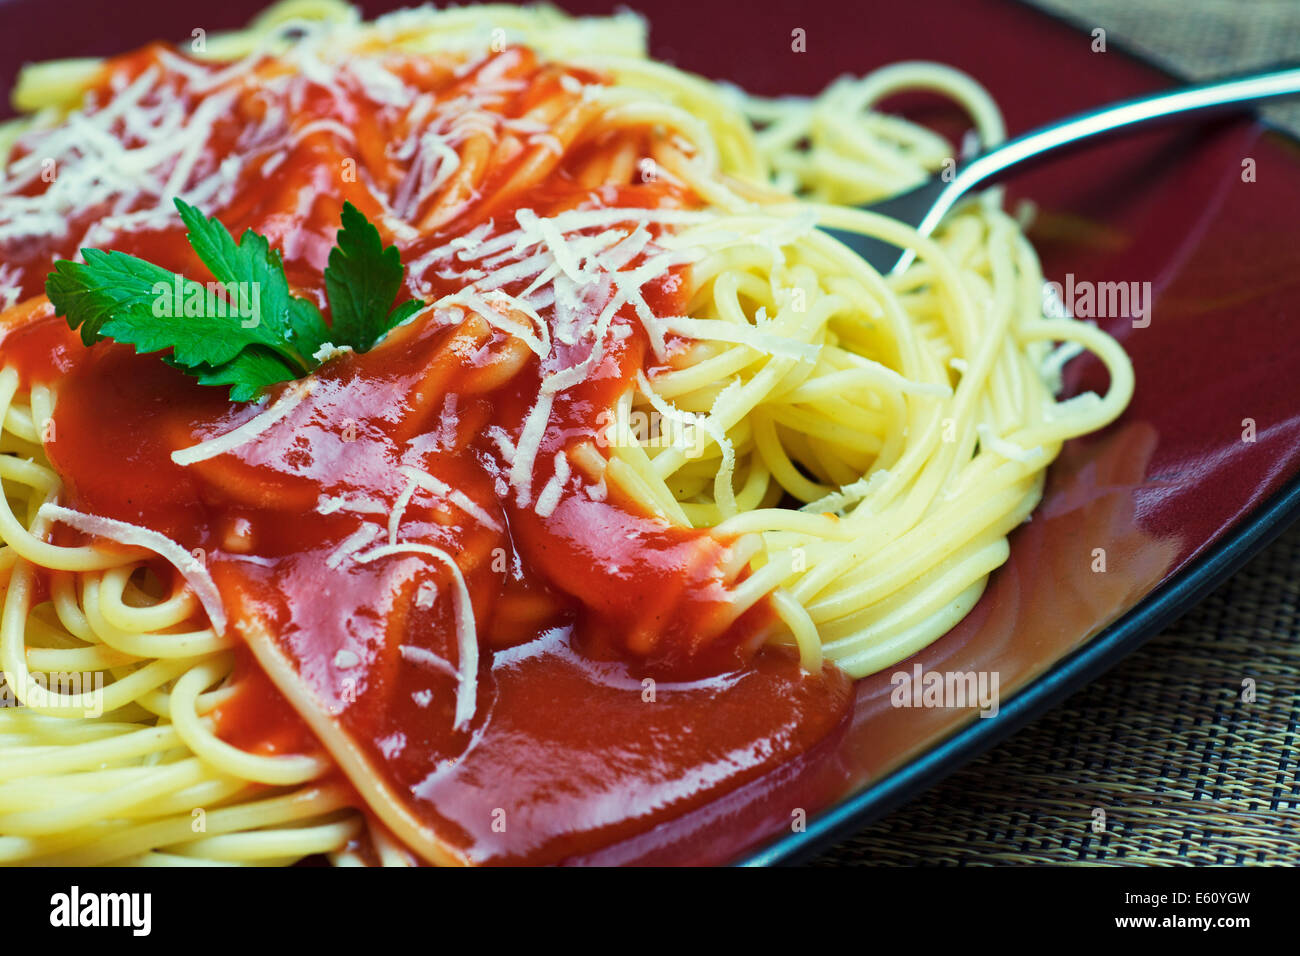 Spaghetti à la sauce tomate, sauce pour pâtes Photo Stock